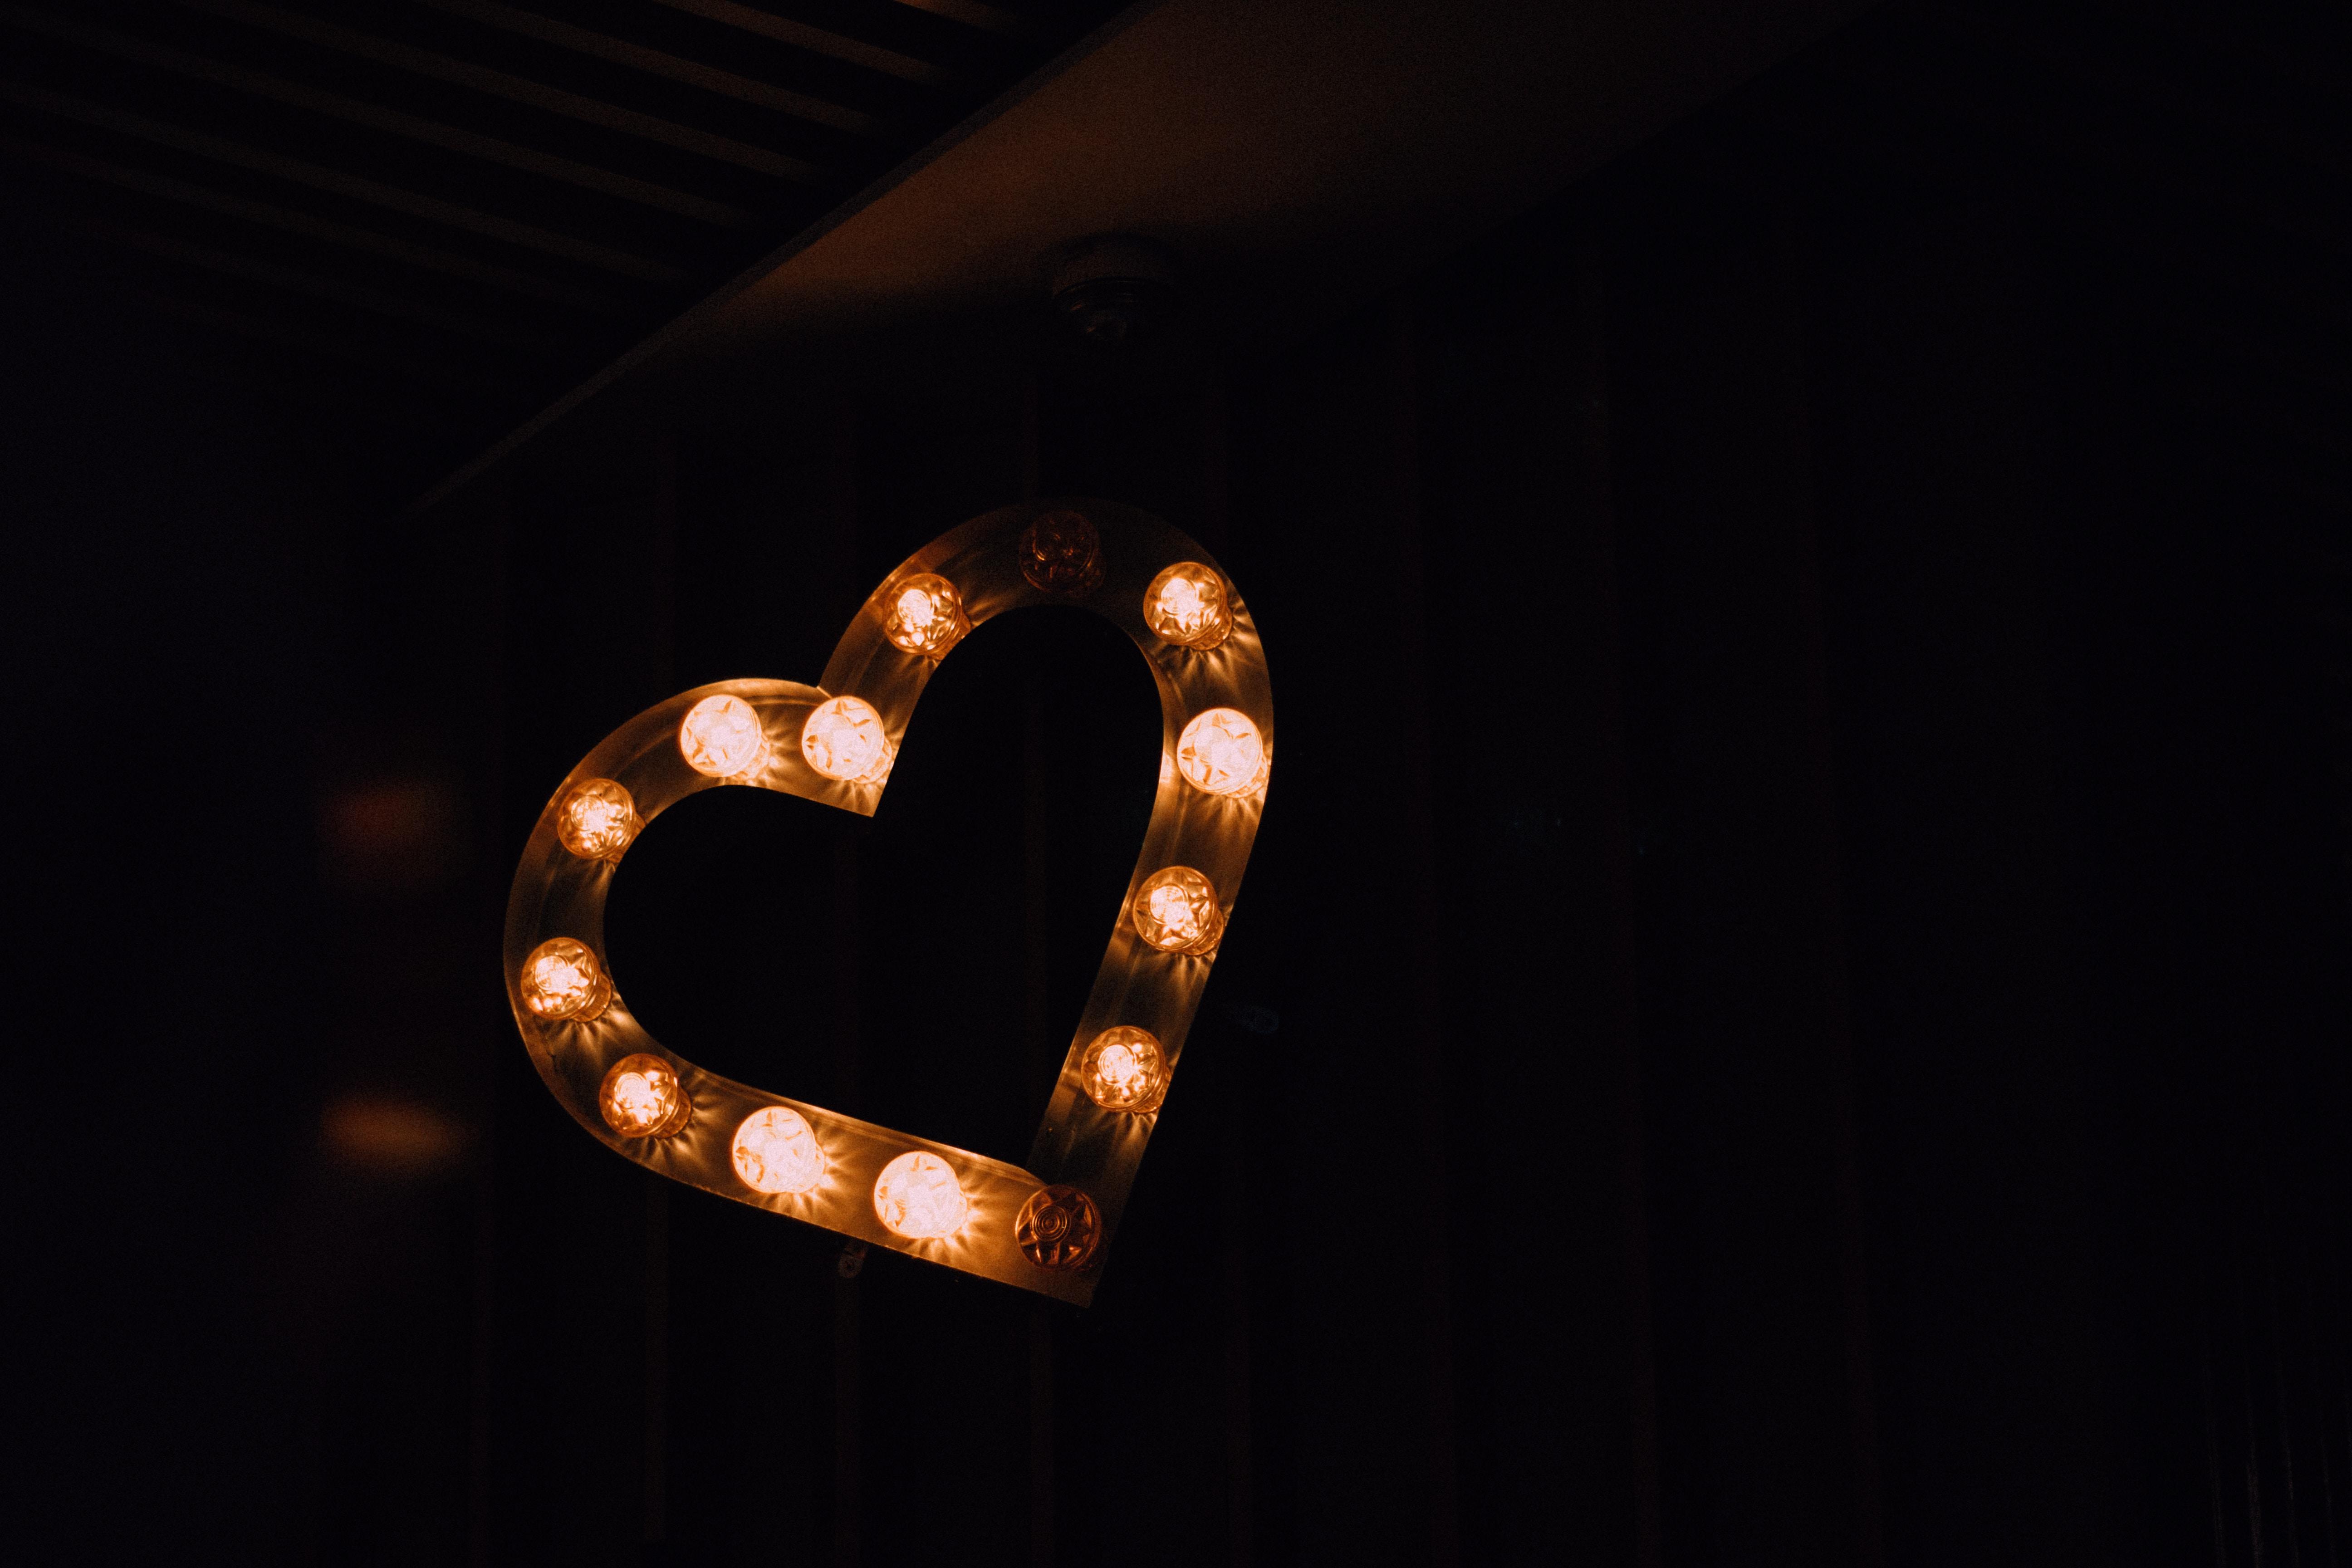 heart-shaped brown wall decor